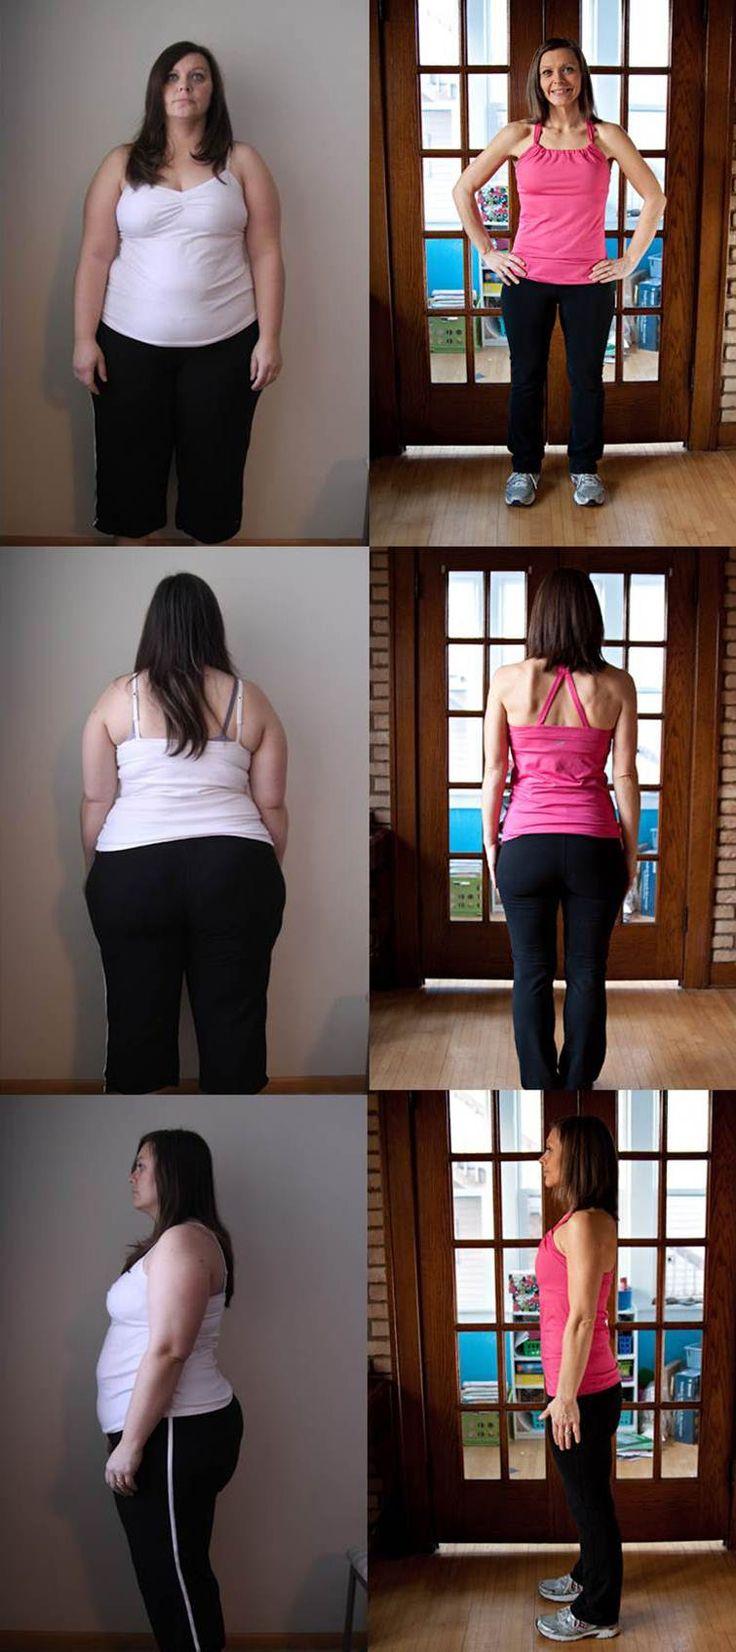 260 lbs - 135 lbs